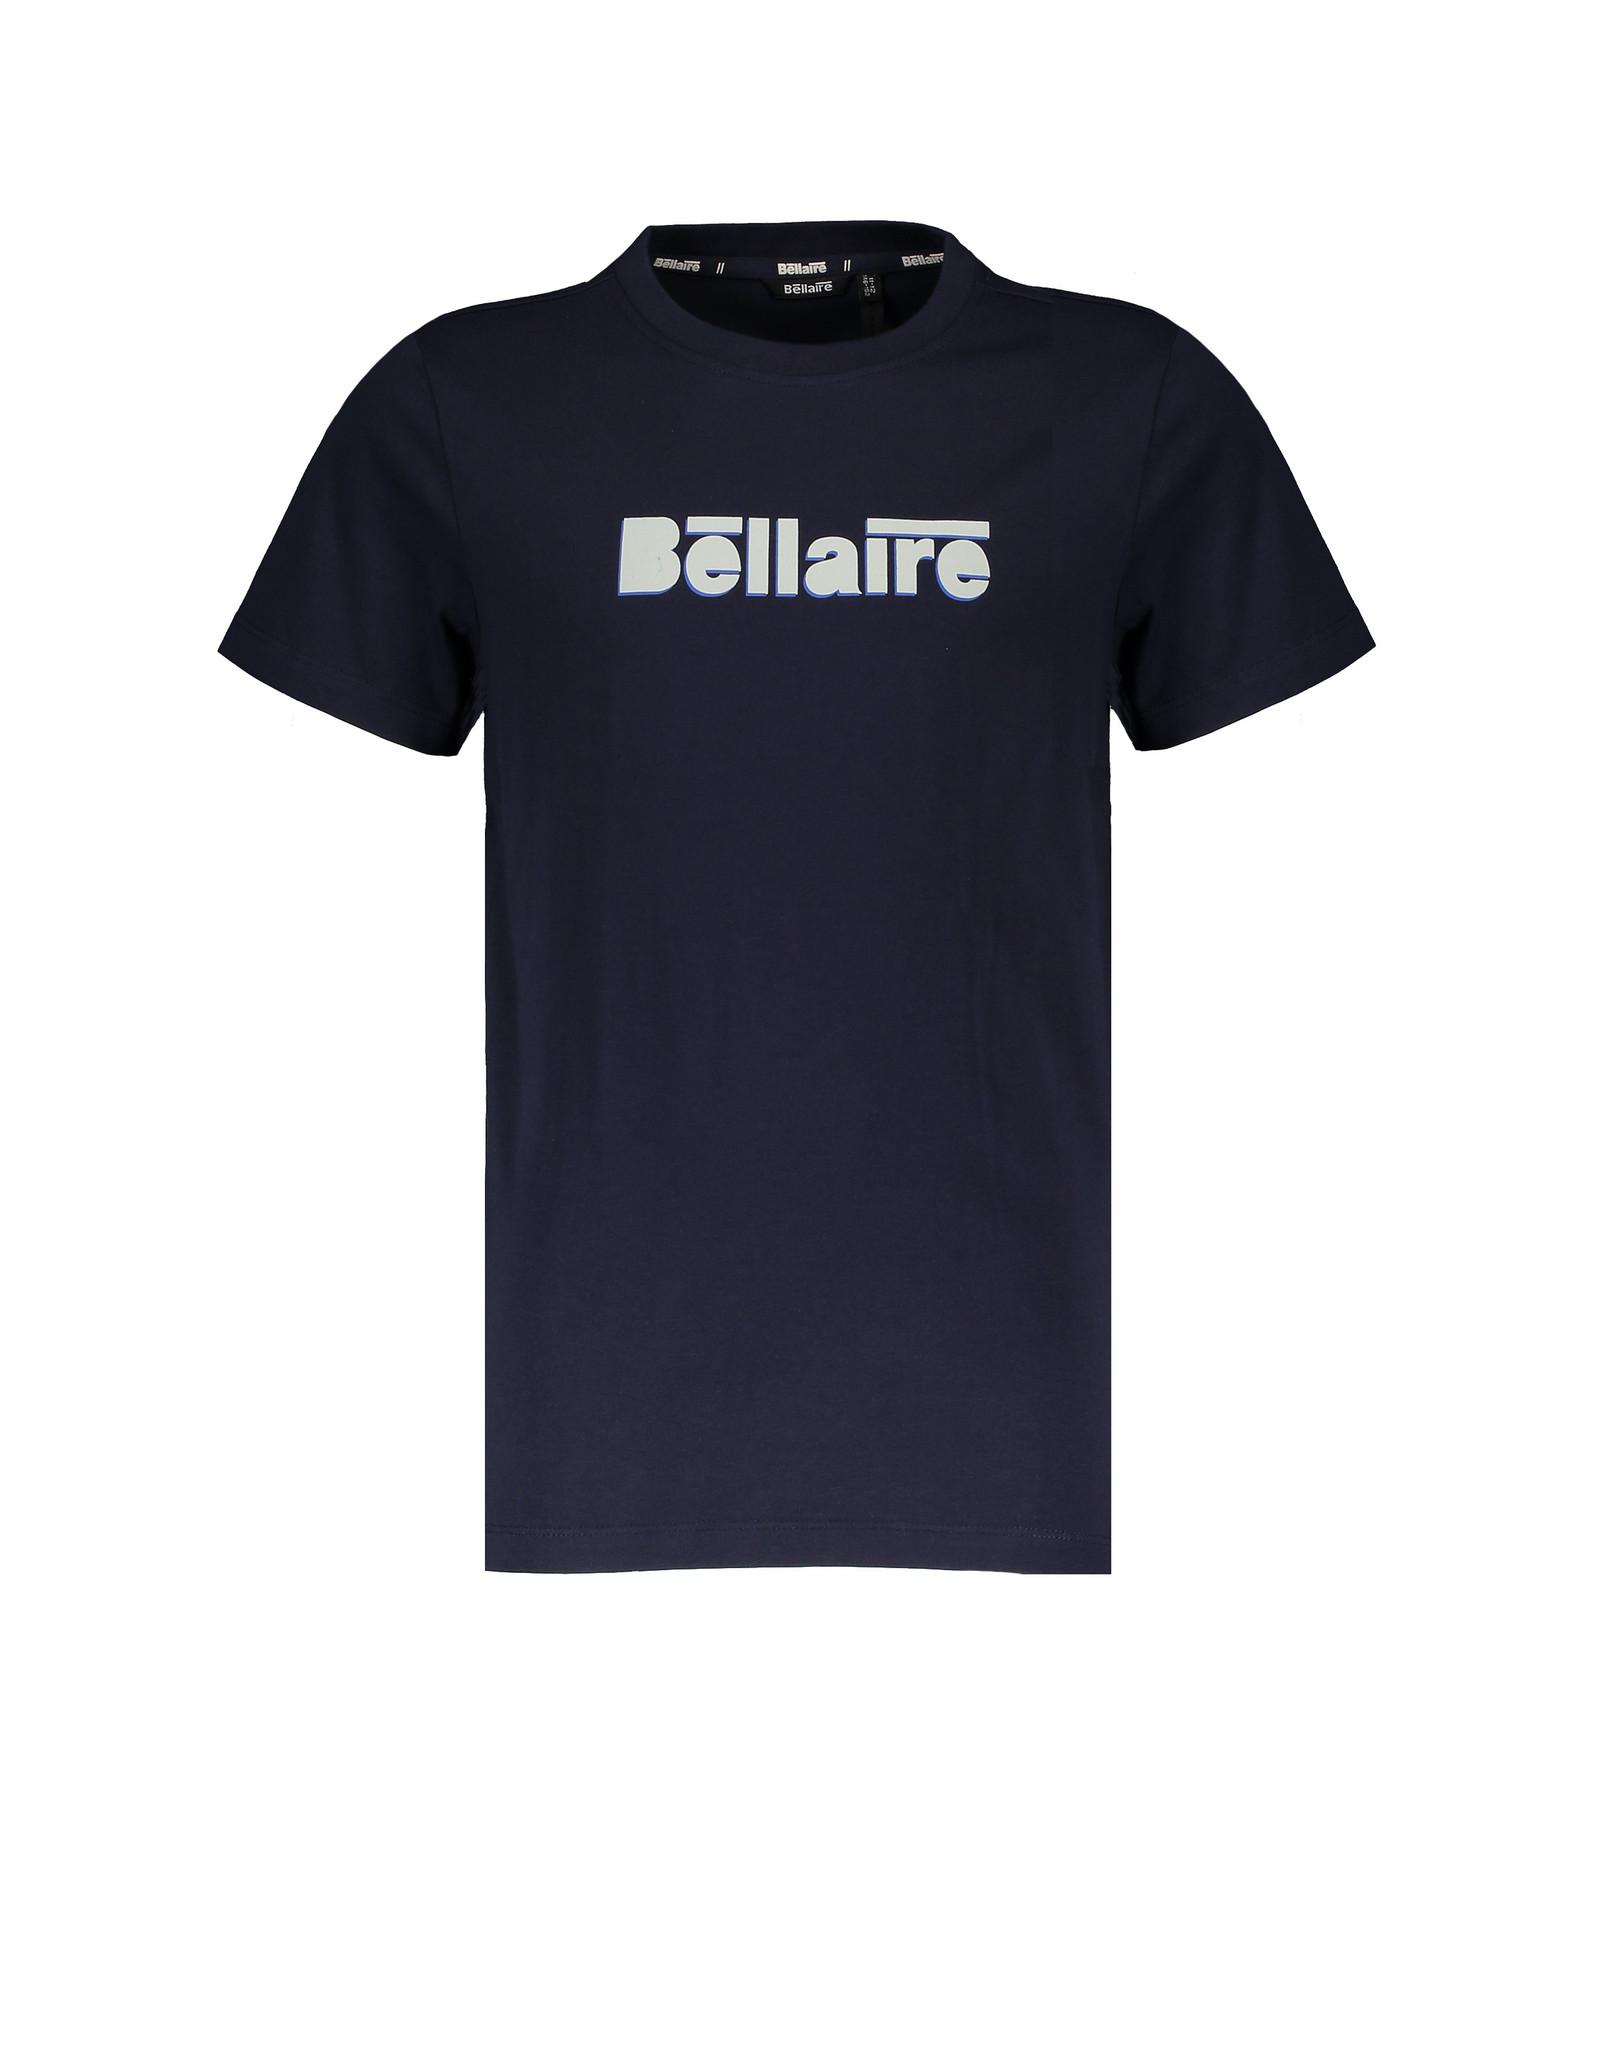 Bellaire Kurt shortsleeves T-shirt + KurtB NB